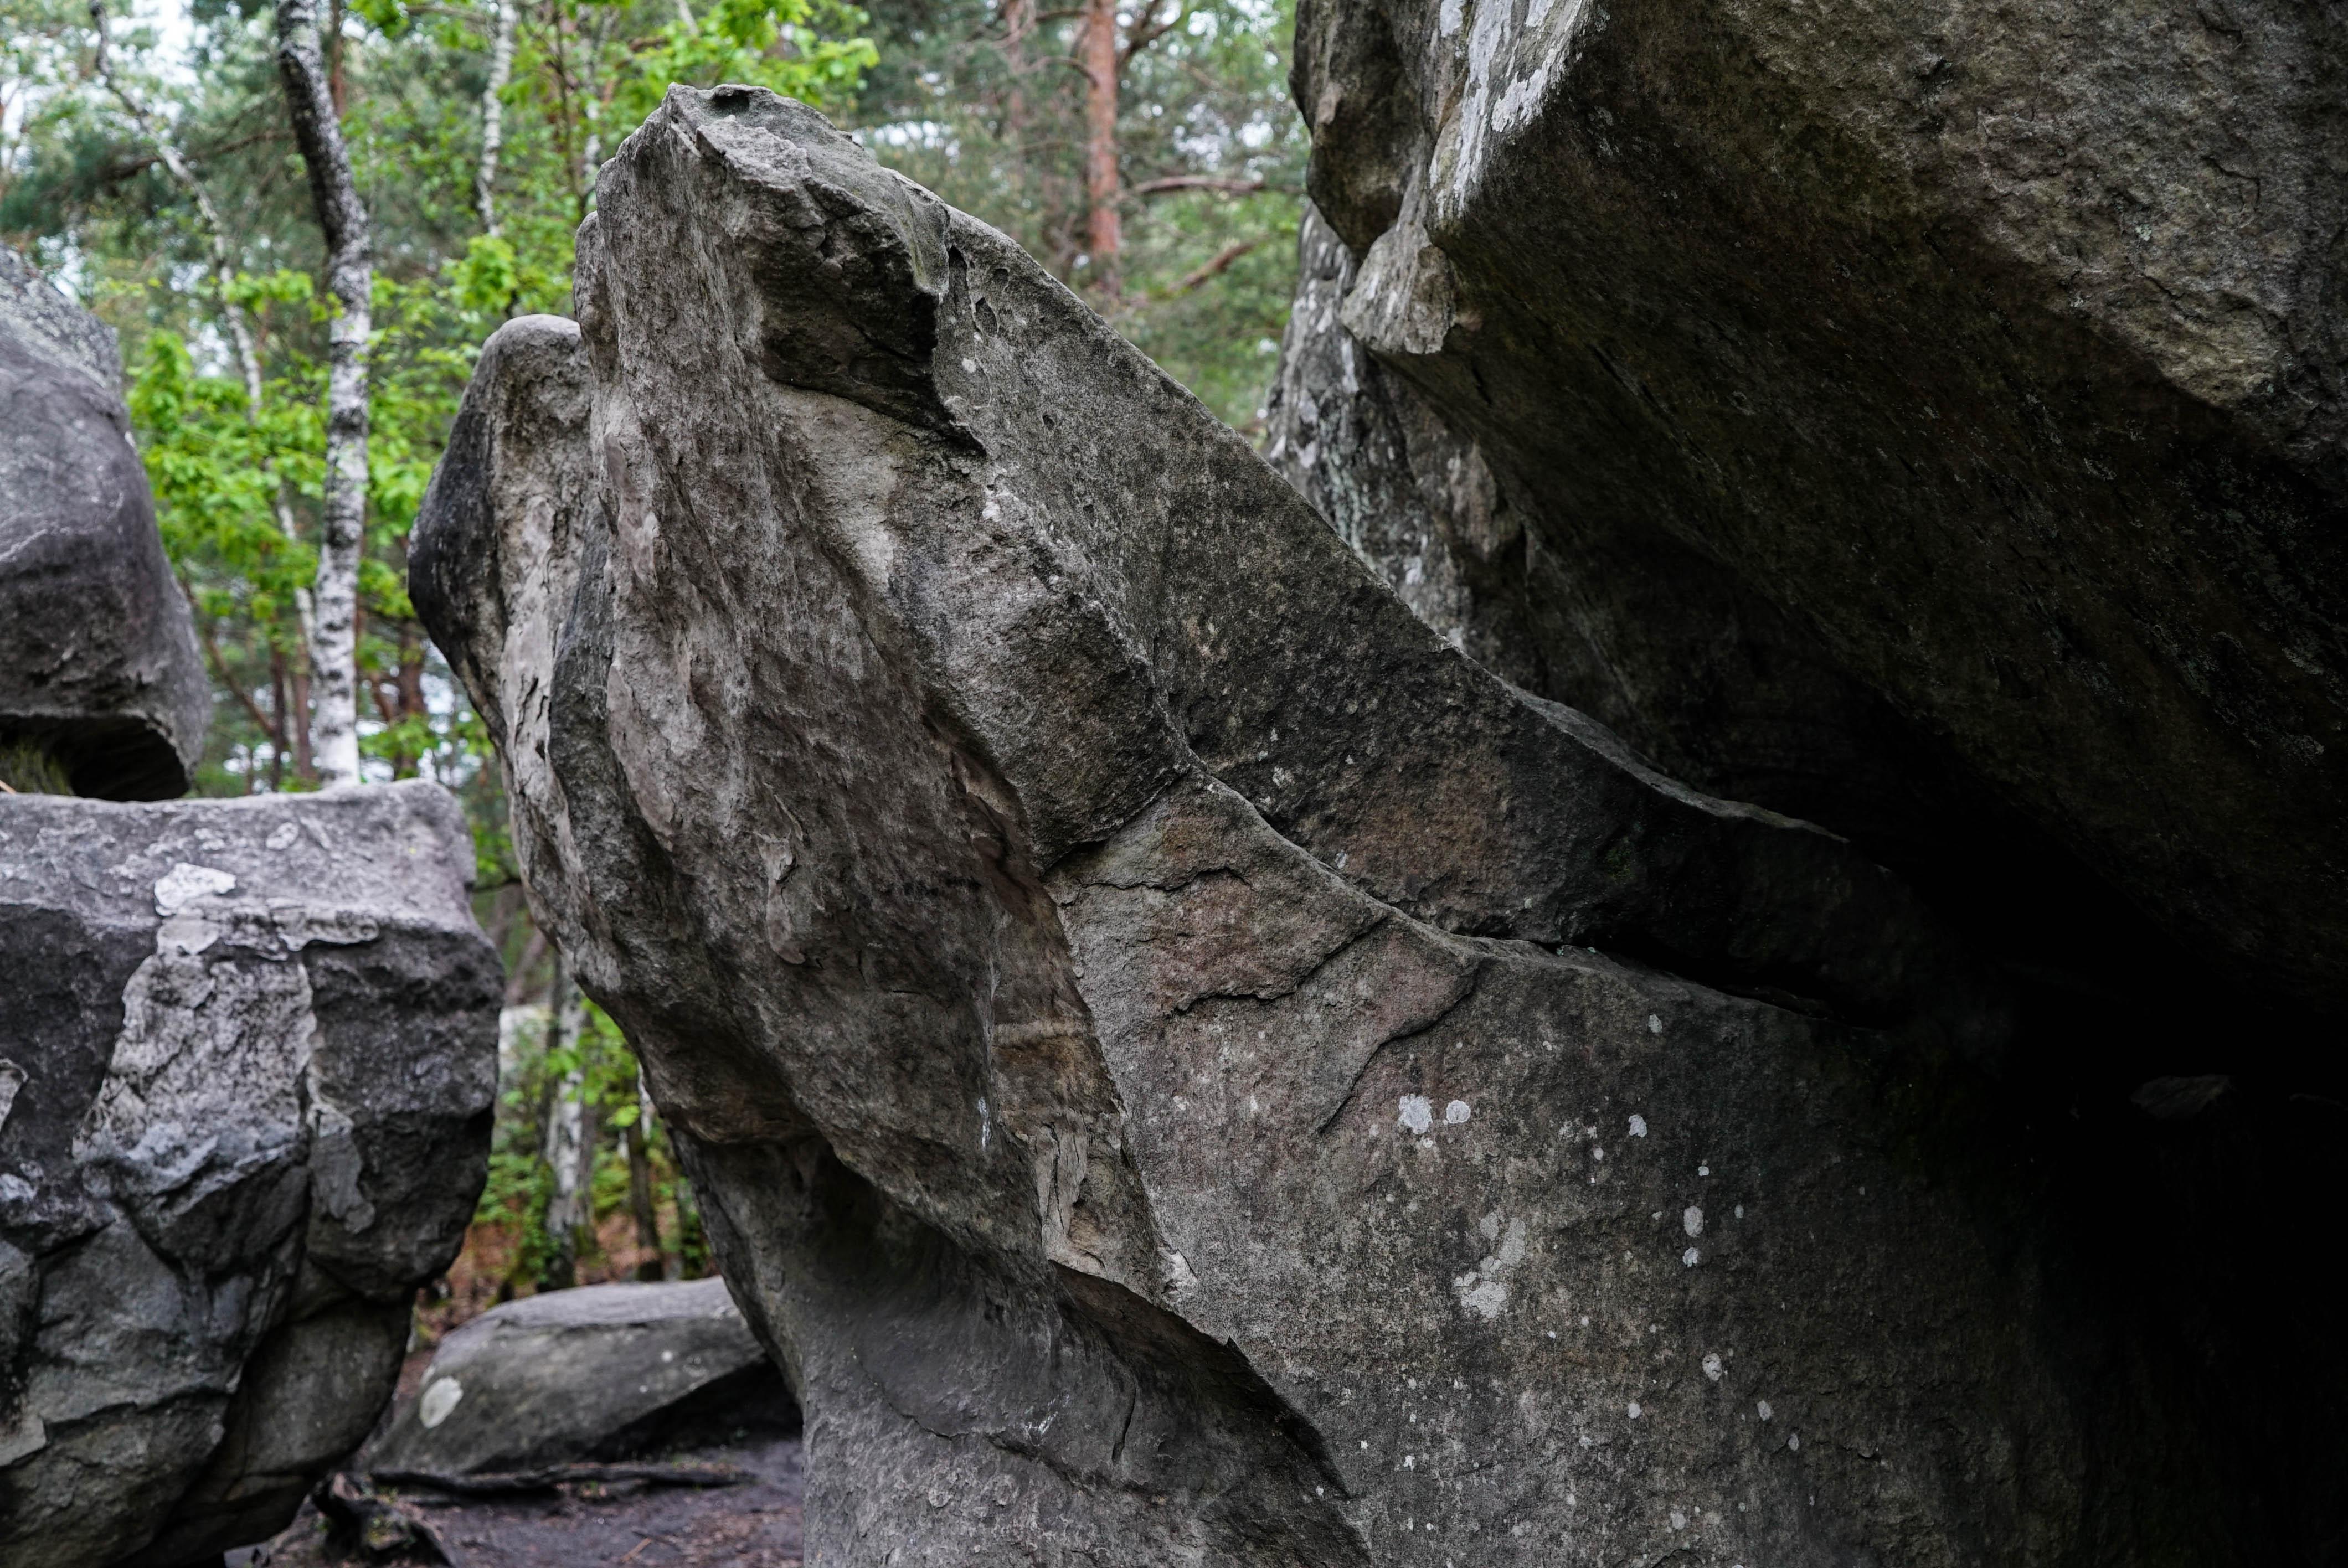 fontainbleau climbing 2016 mike brindley-64